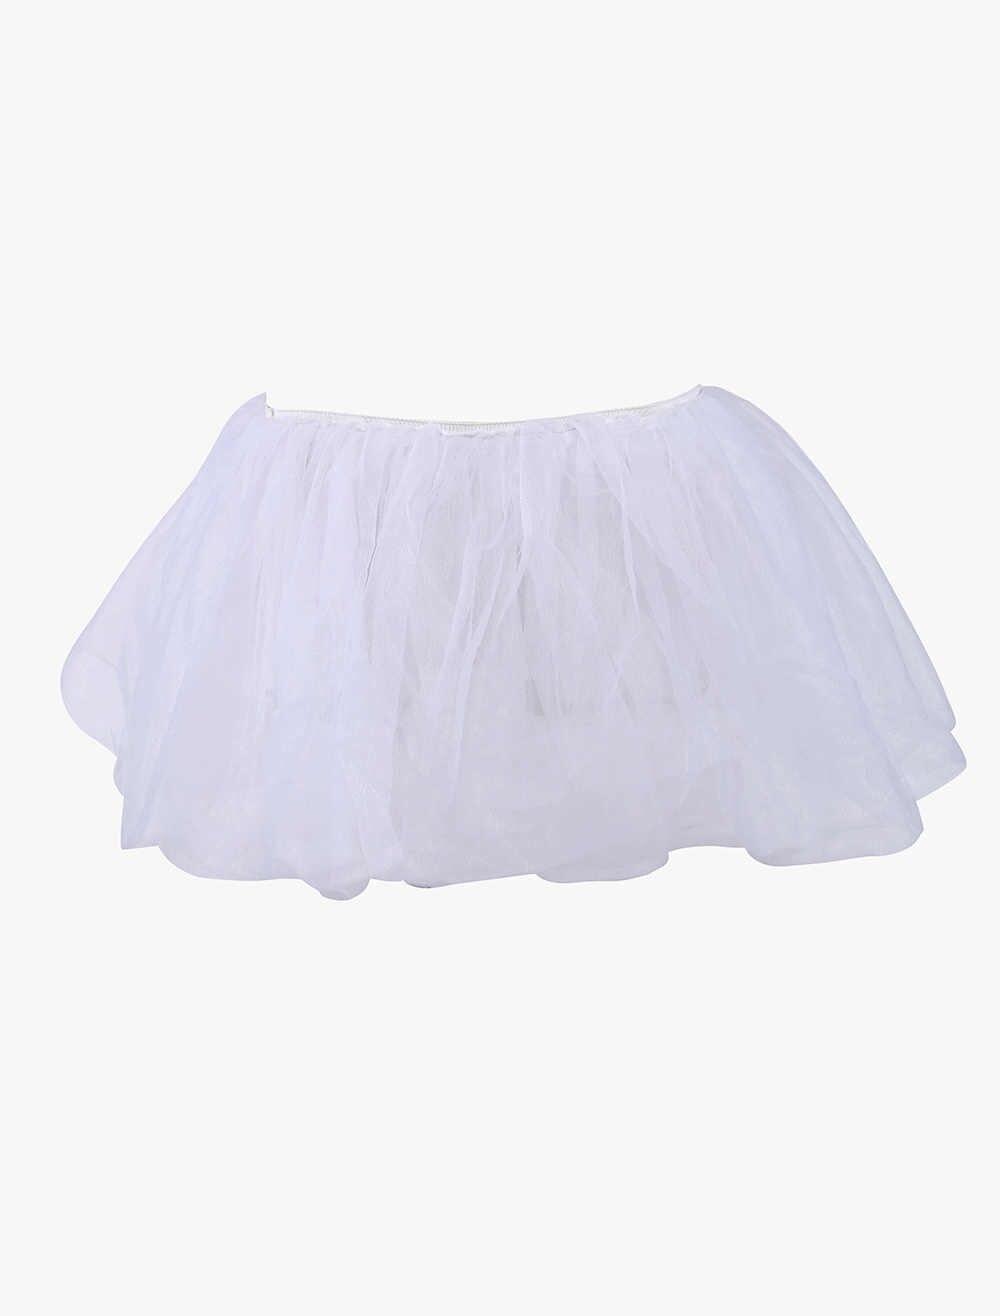 6eb1b9928 ... MOONIGHT Sexy Petticoat Satin Mini Tutu Skirt Ball Gown Ruffle Frilly  Corset Skirts ...